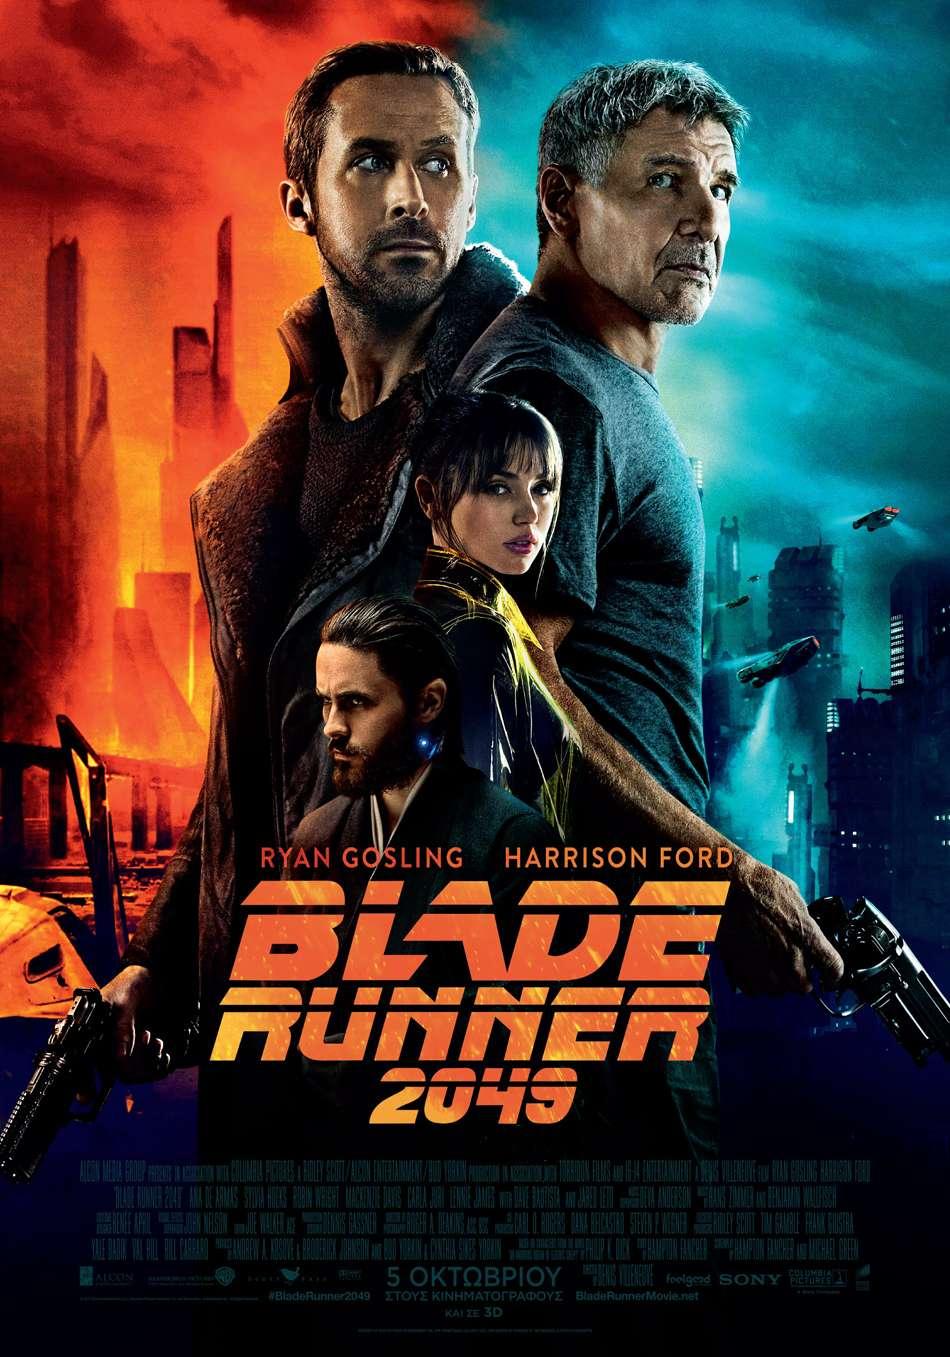 Blade Runner 2049 Poster Πόστερ